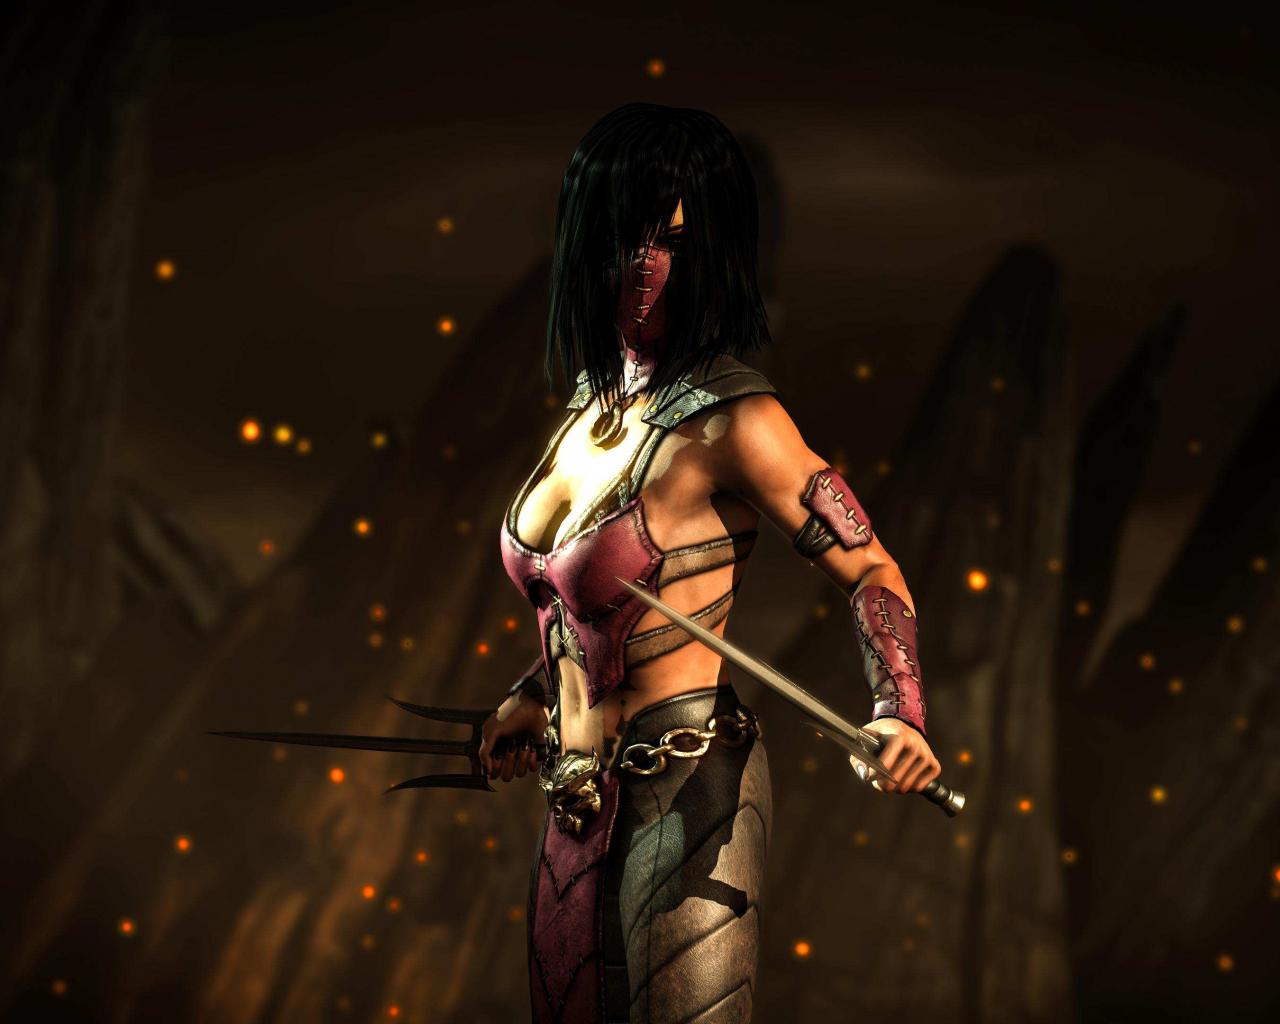 [45+] Mortal Kombat Mileena Wallpaper on WallpaperSafari